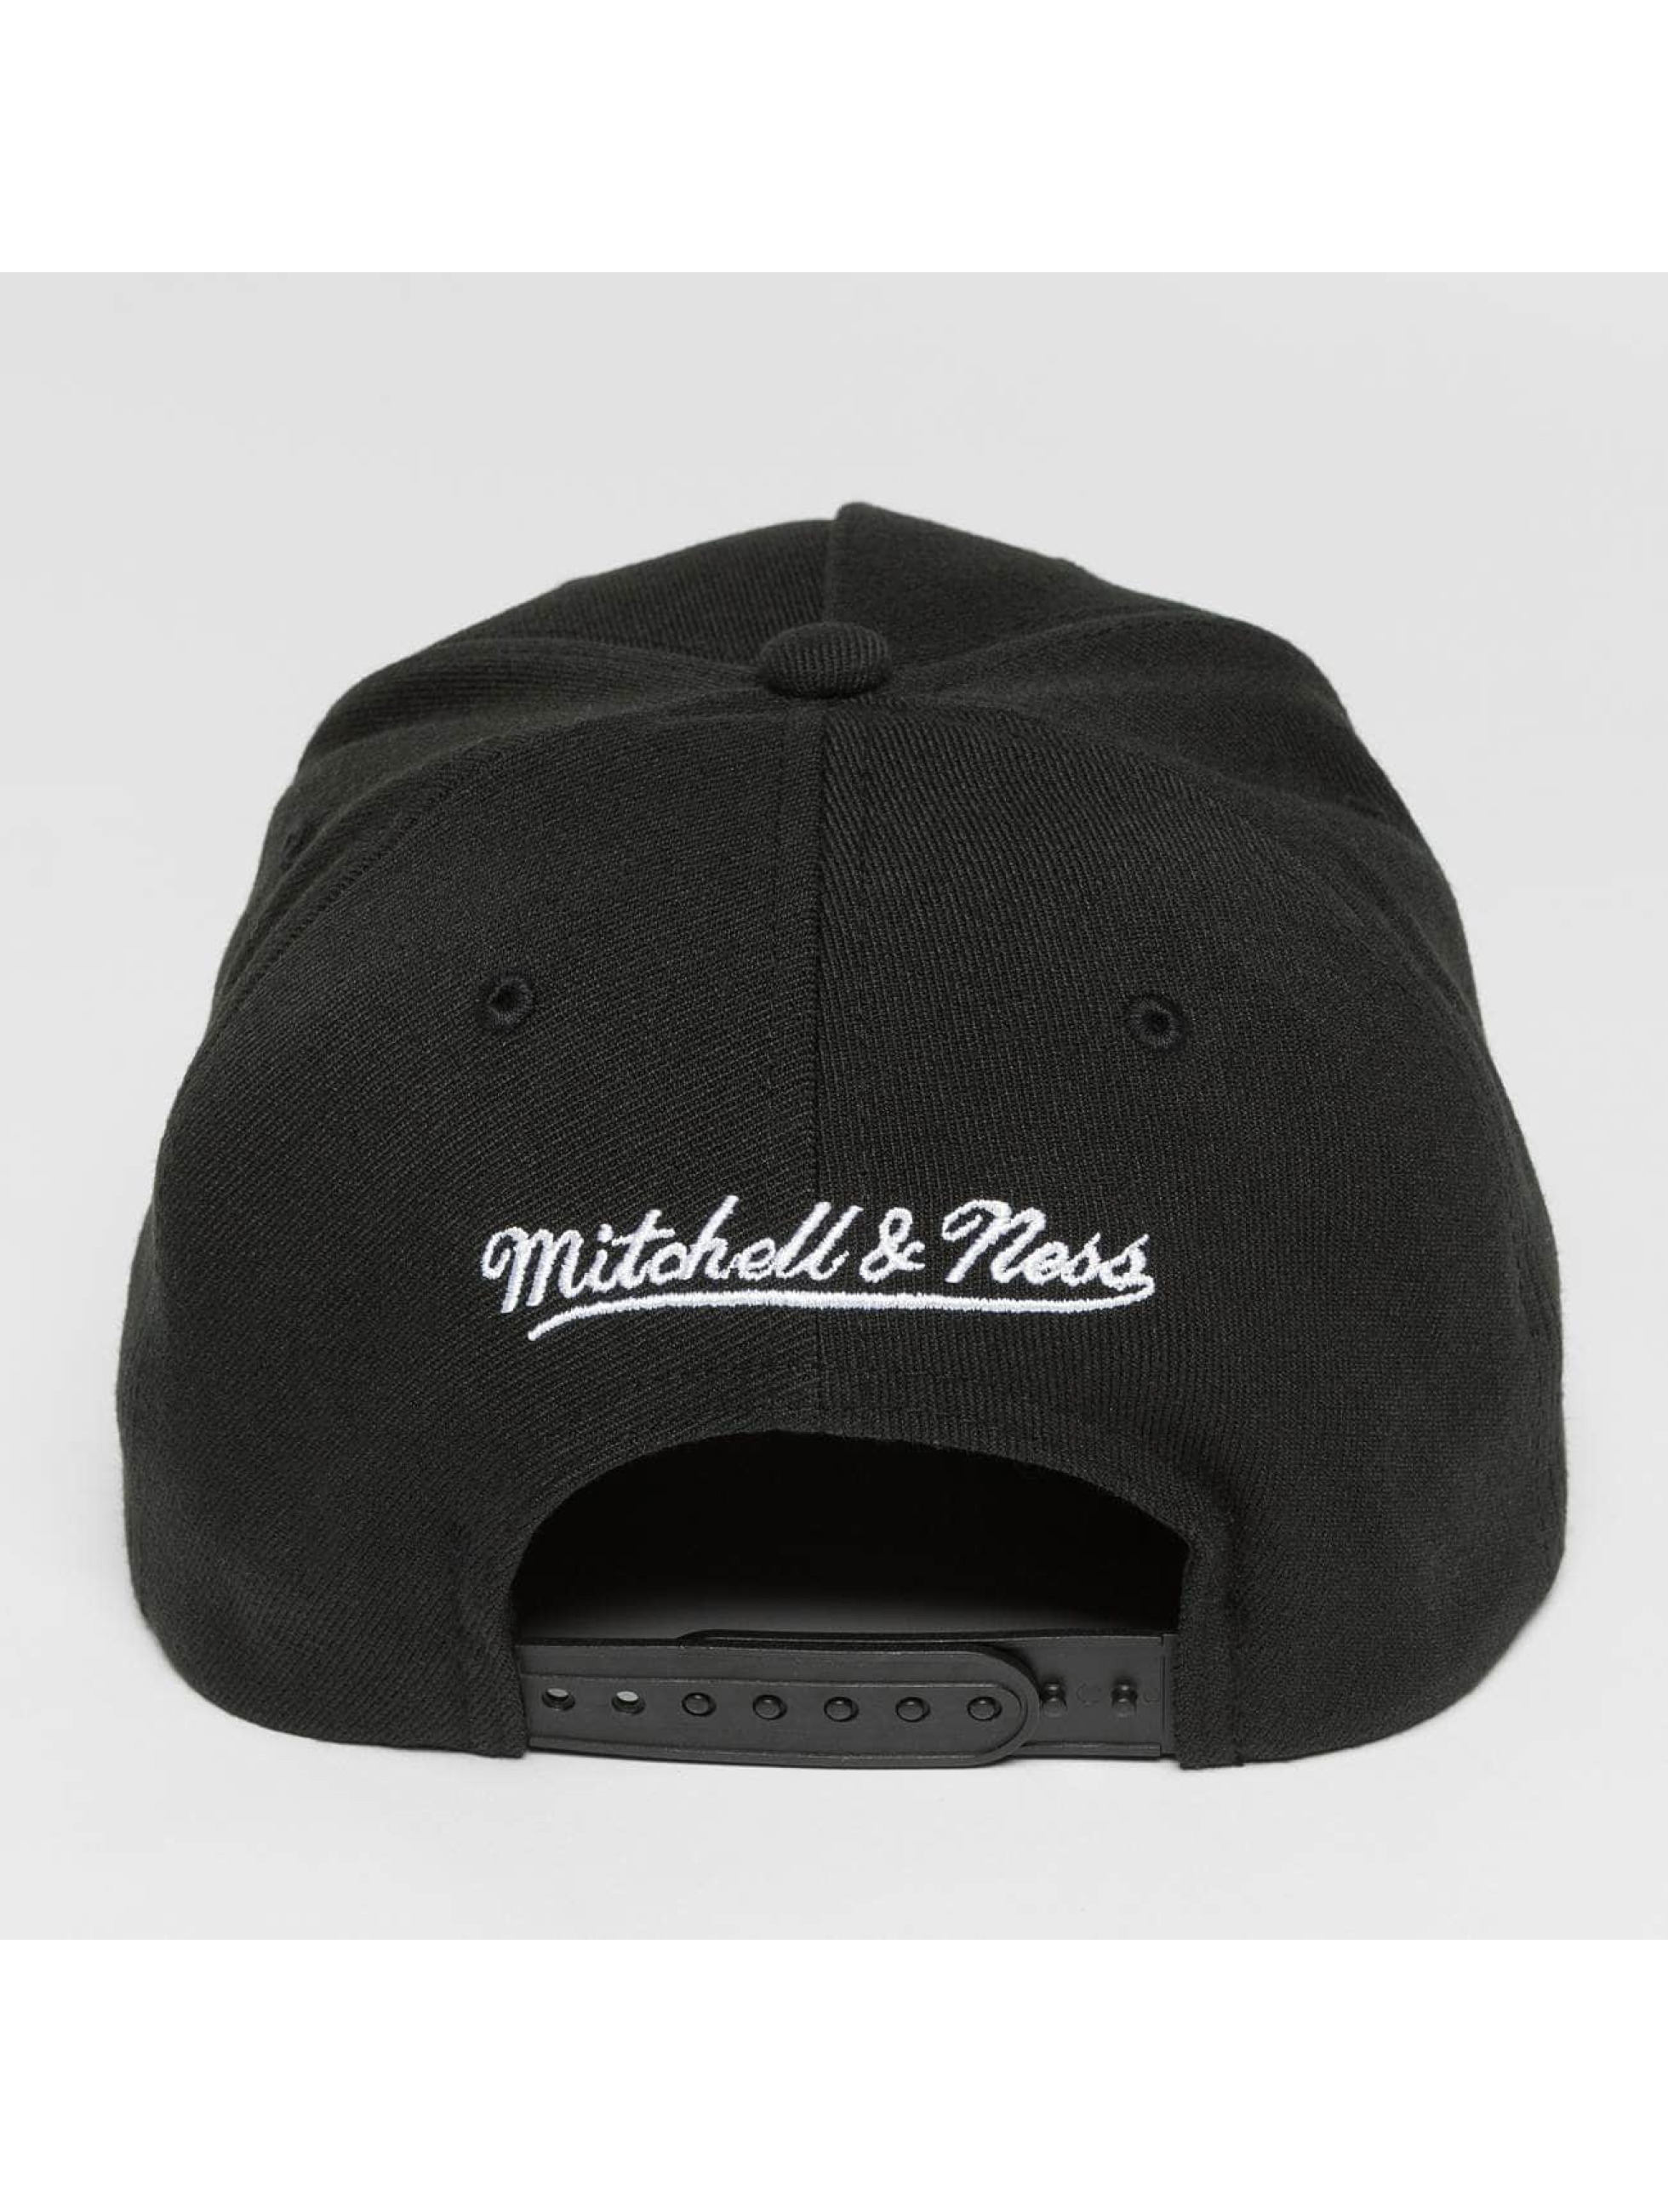 Mitchell & Ness Casquette Snapback & Strapback NBA Denim Visor Chicago Bulls noir